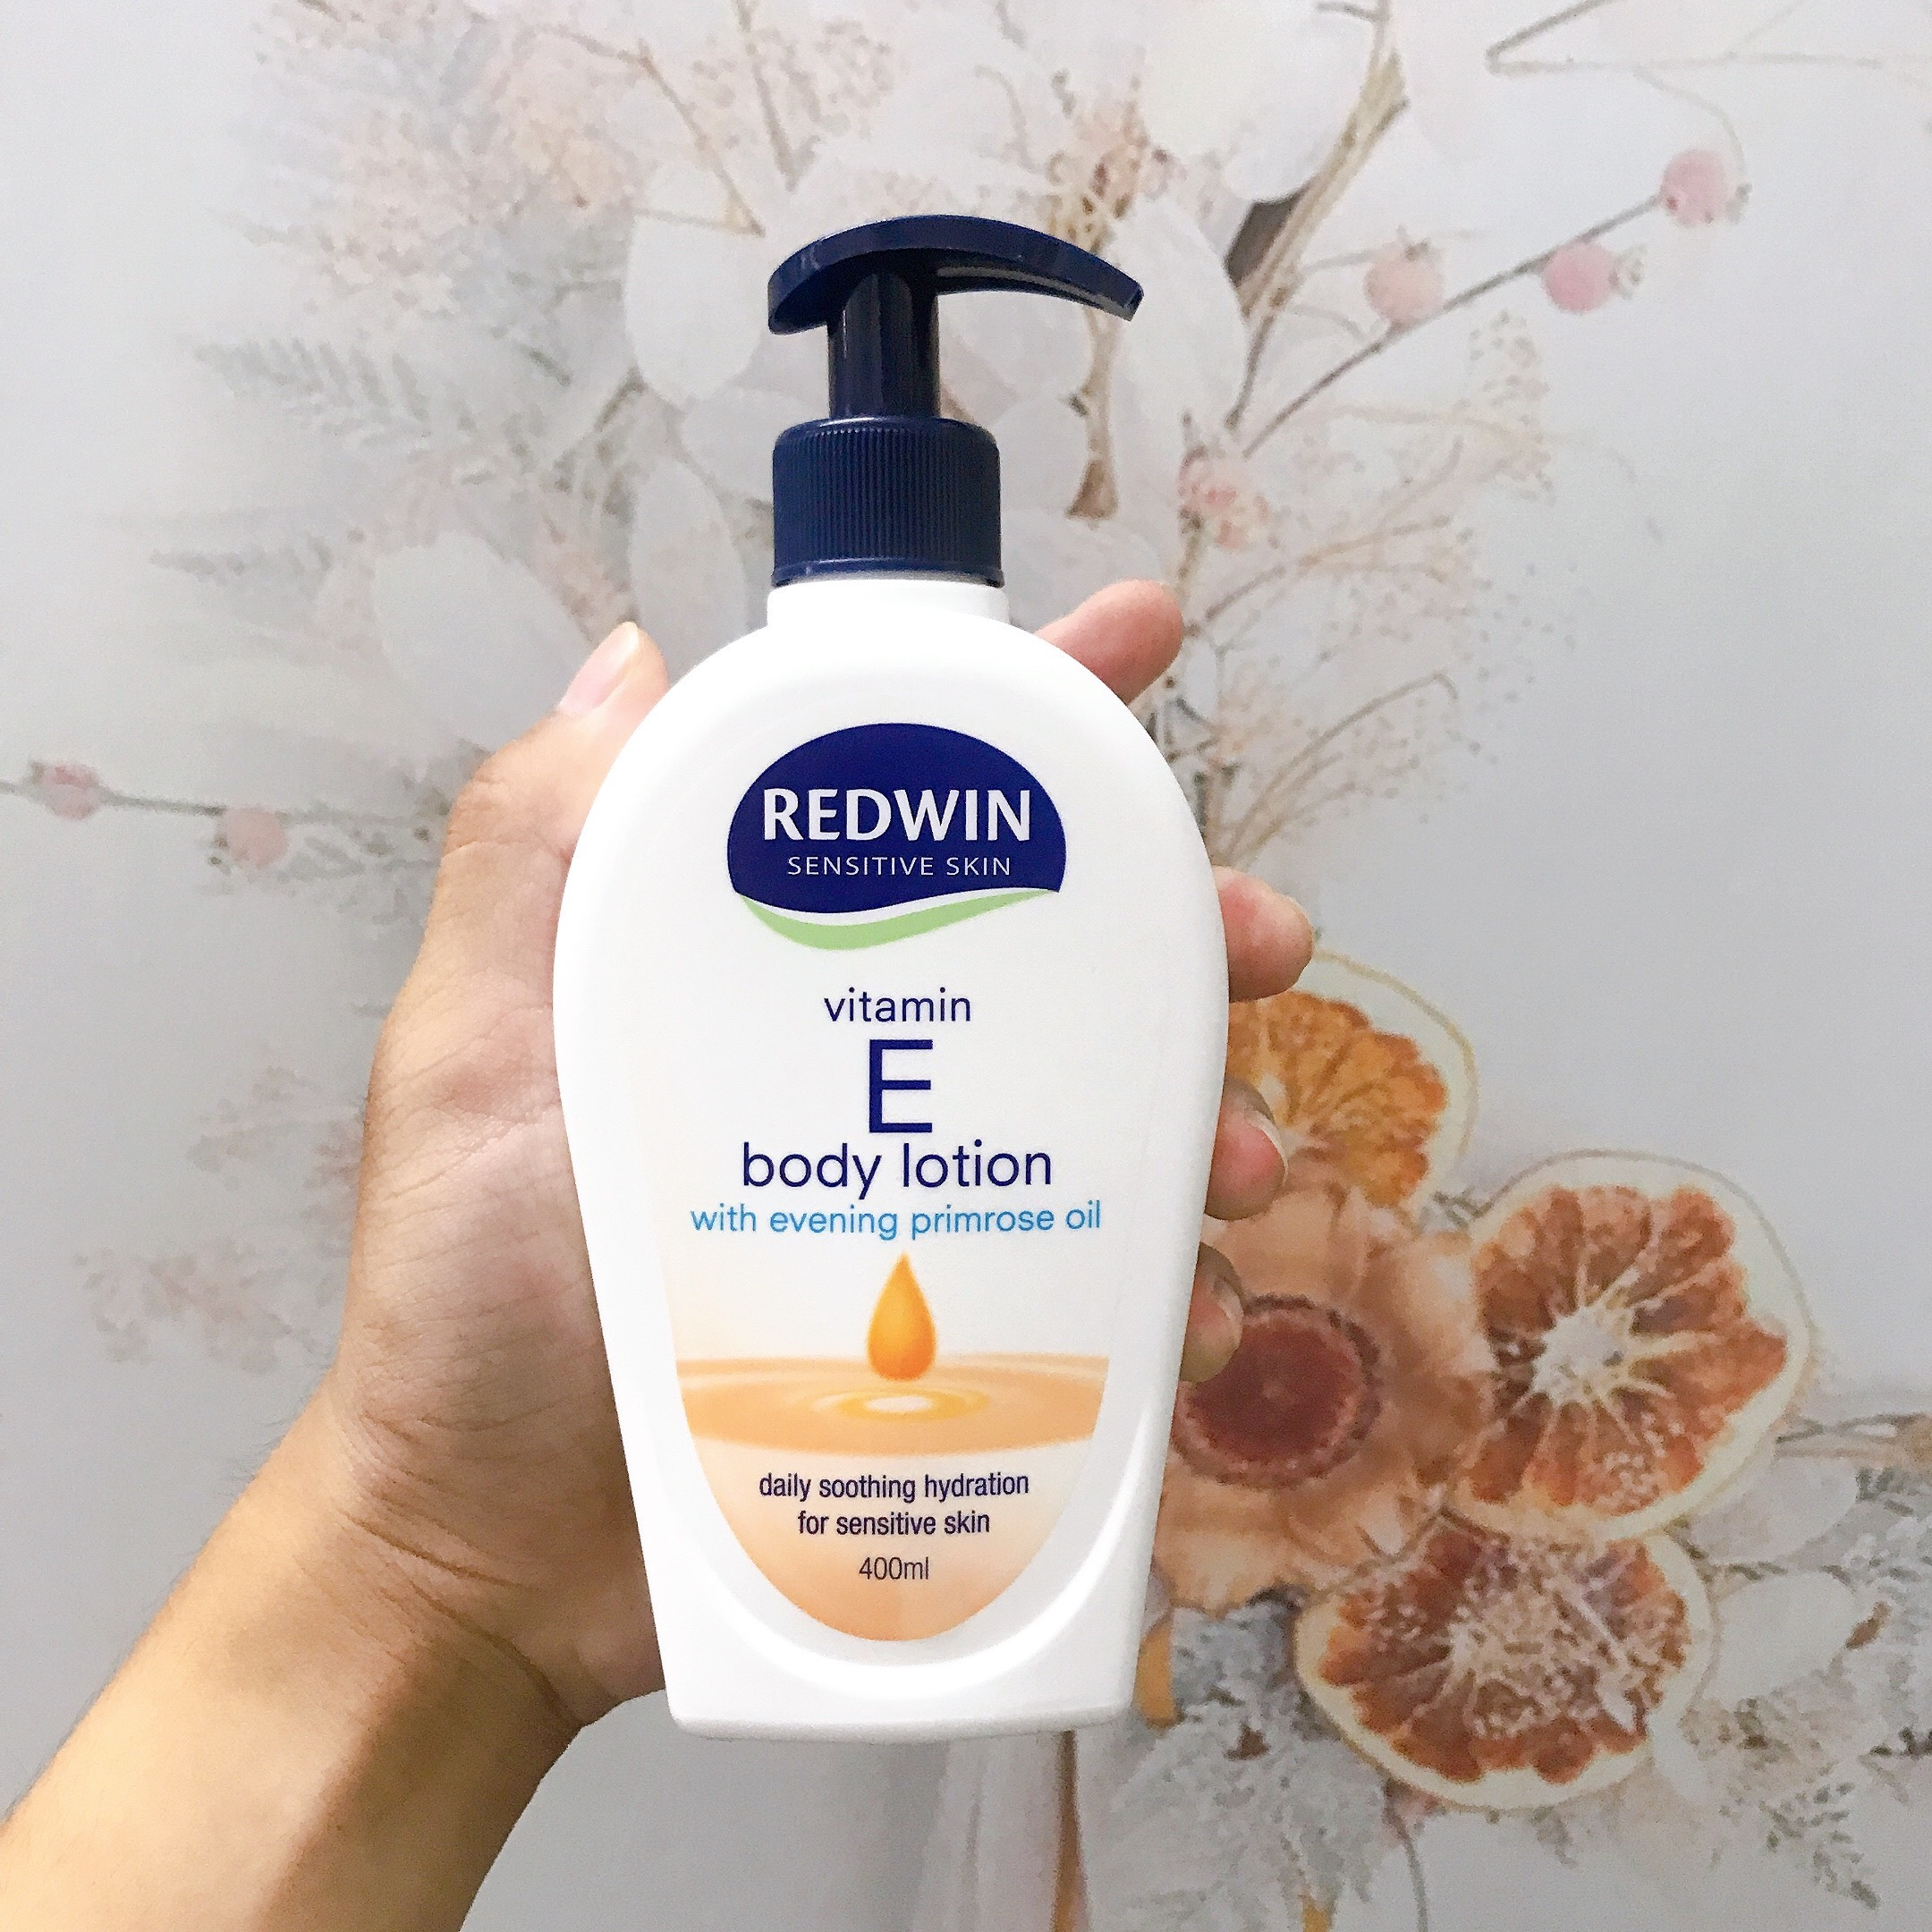 Sữa Dưỡng Thể Redwin Vitamin E Body Lotion With Evening Primrose Oil 400ml